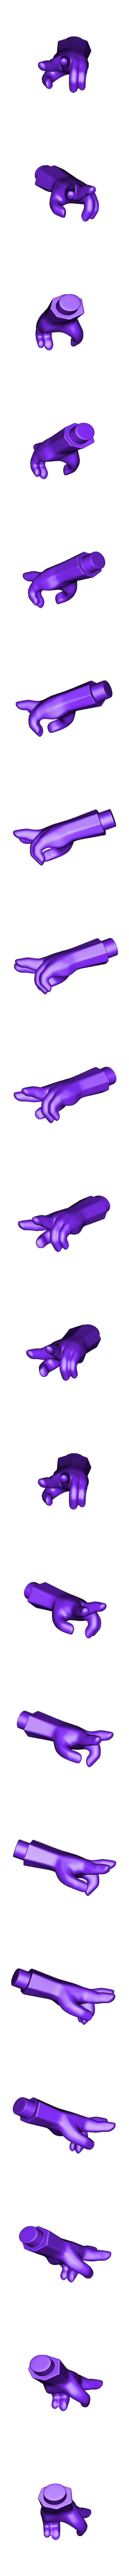 Master_roshi_main_gauche.stl Download free STL file Master Roshi Dragon Ball Z • 3D printing object, Gatober